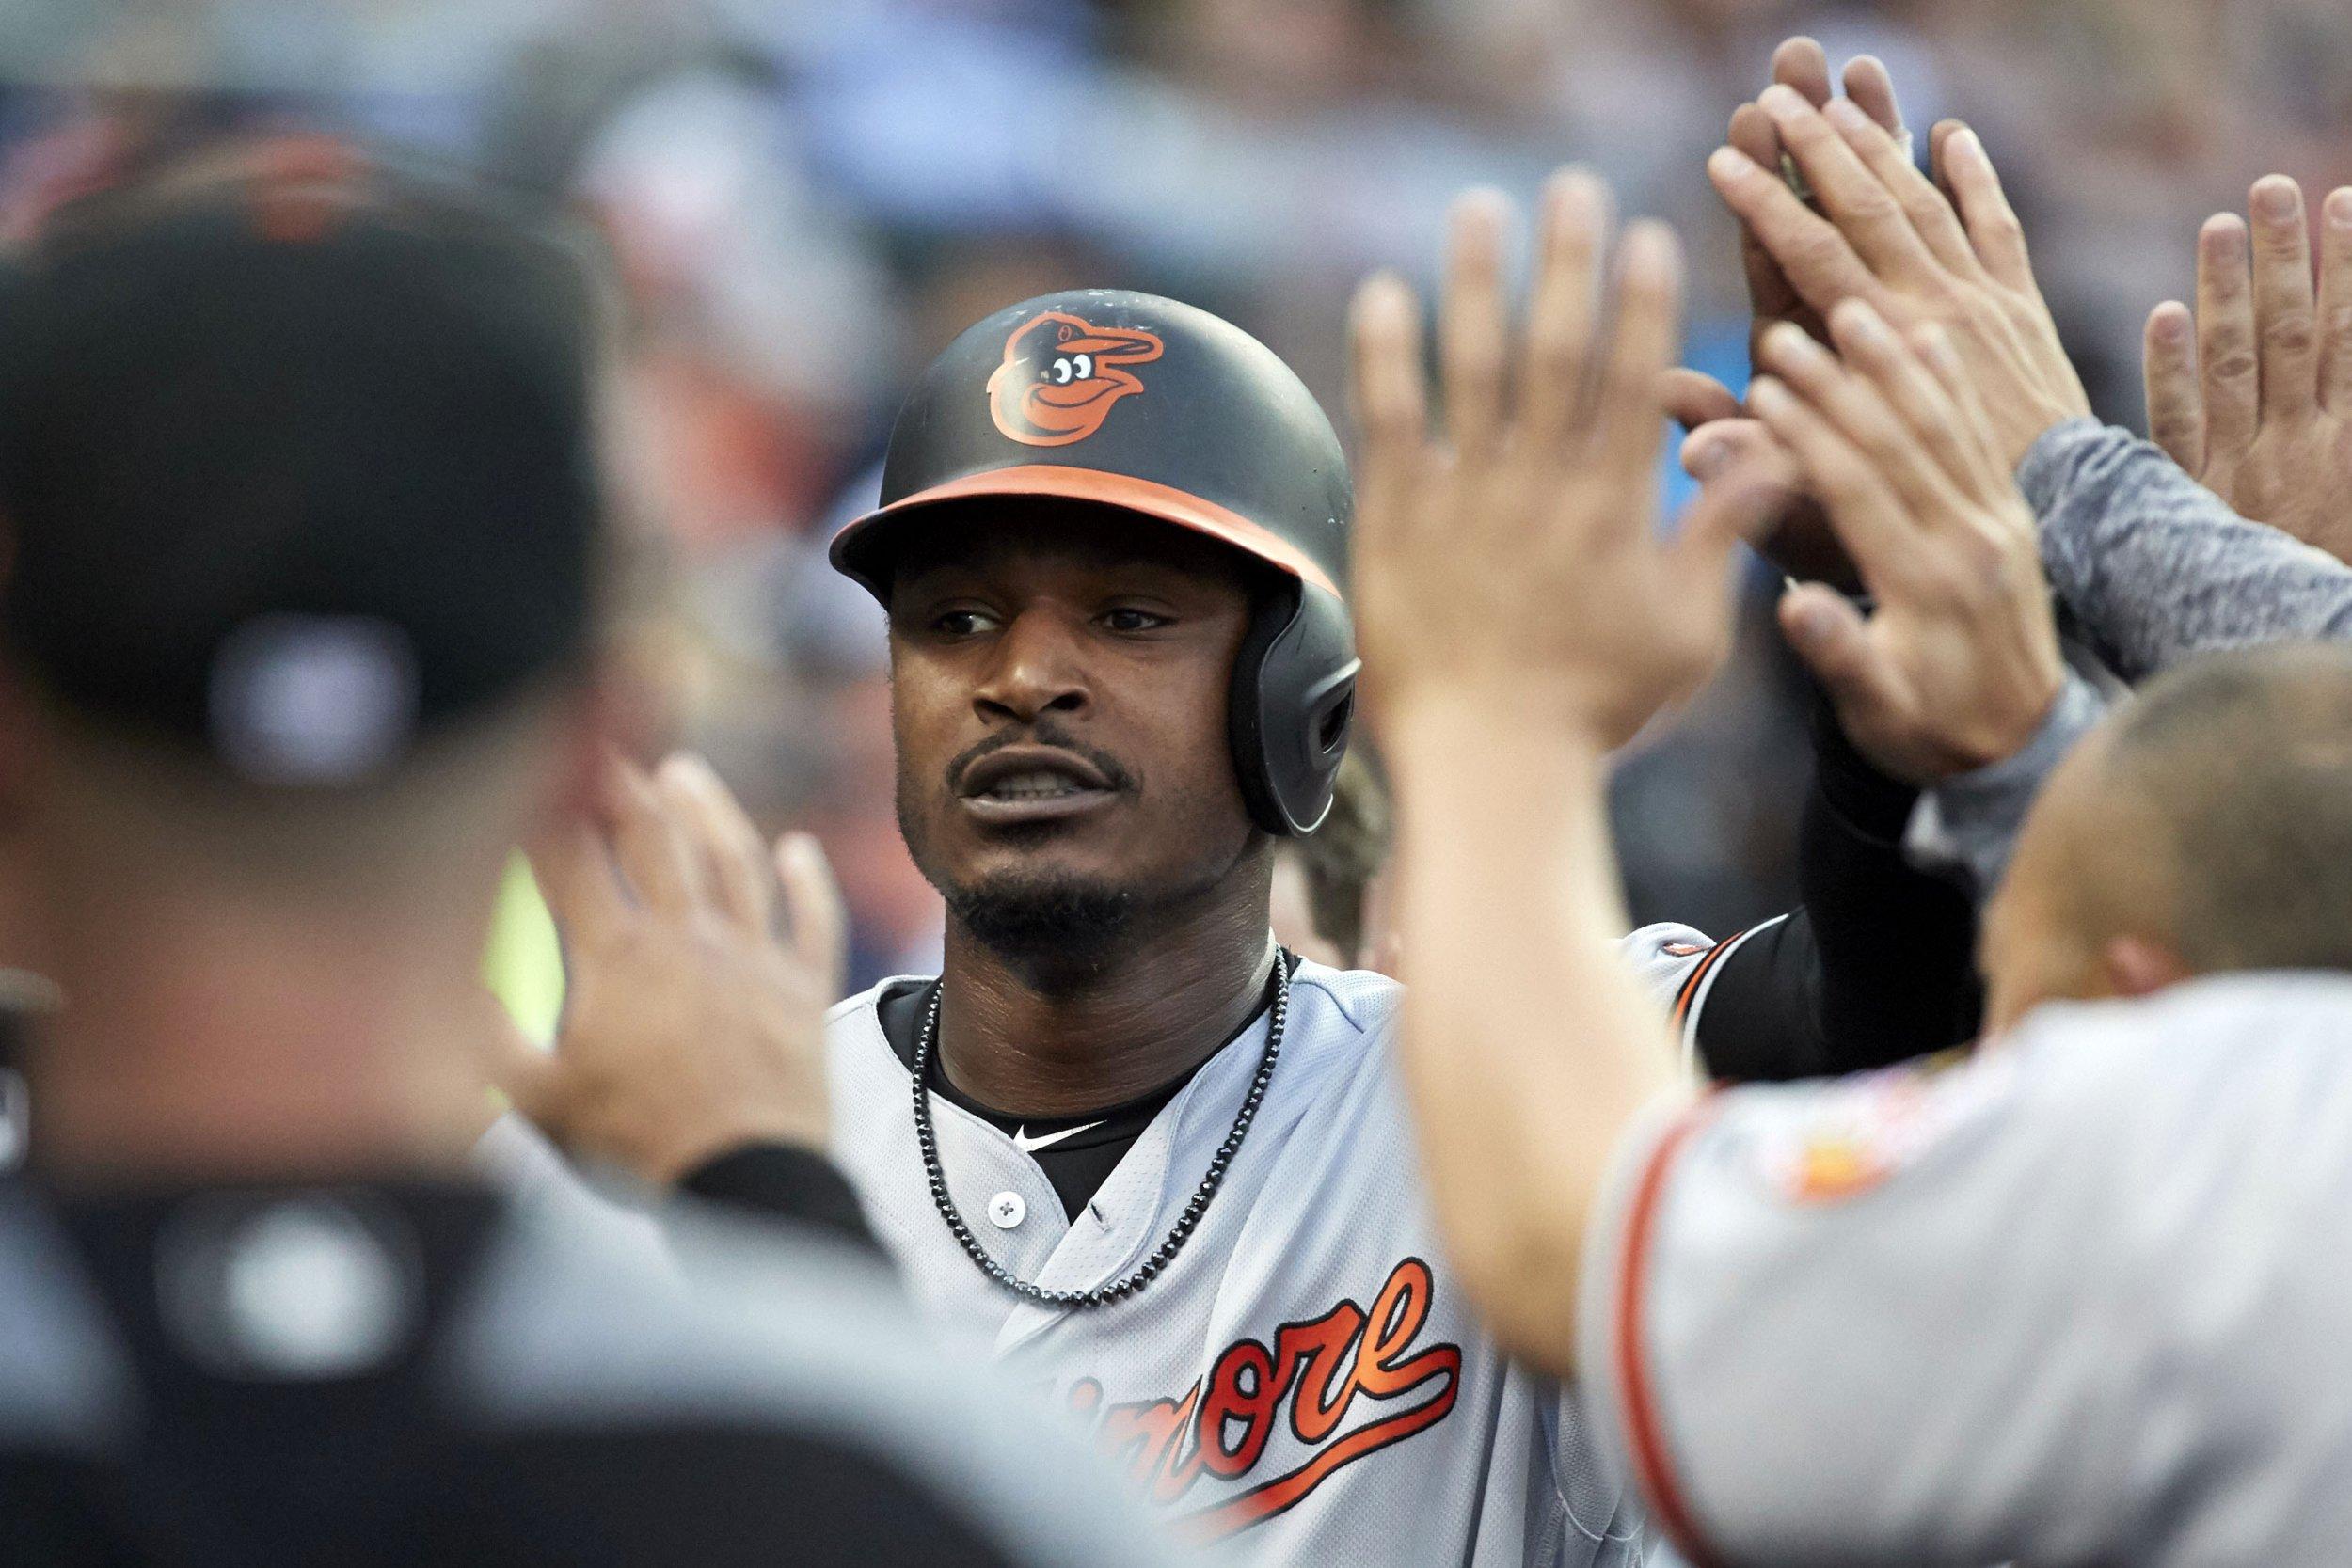 Baltimore Orioles outfielder Adam Jones.